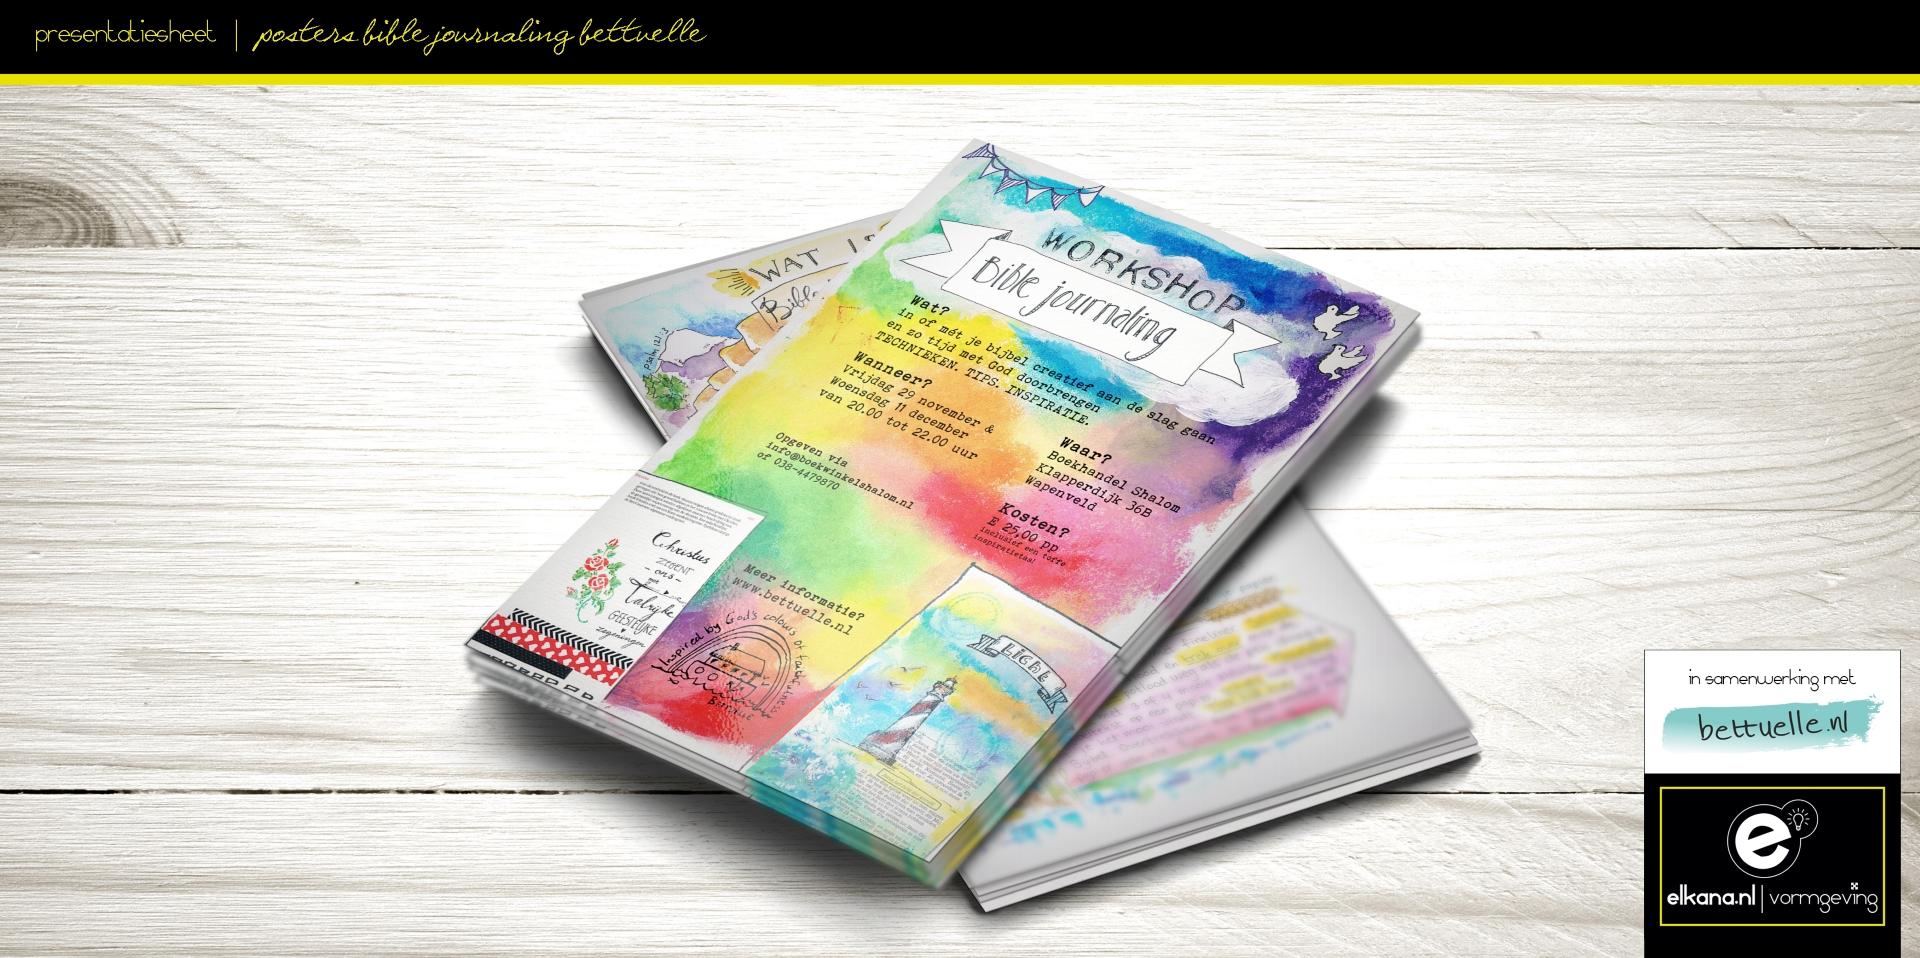 Poster Biblejournaling – Bettuelle